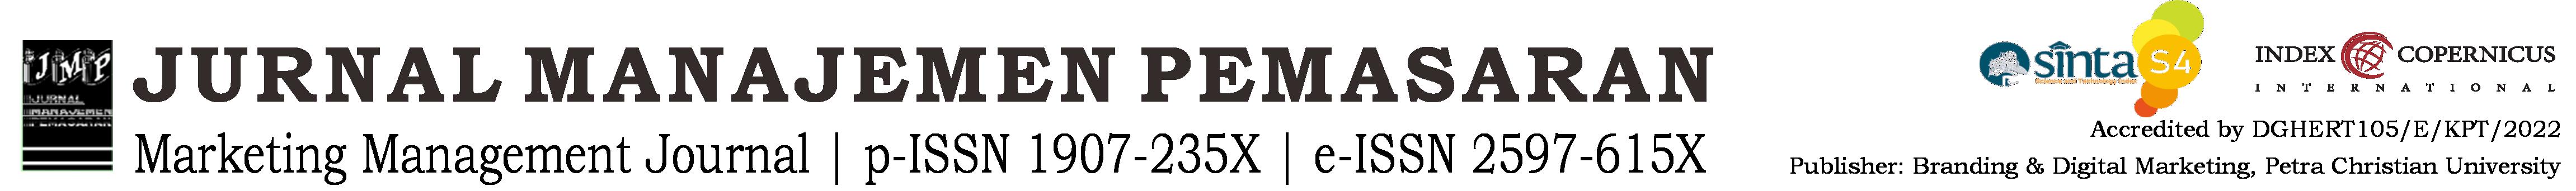 Jurnal Manajemen Pemasaran